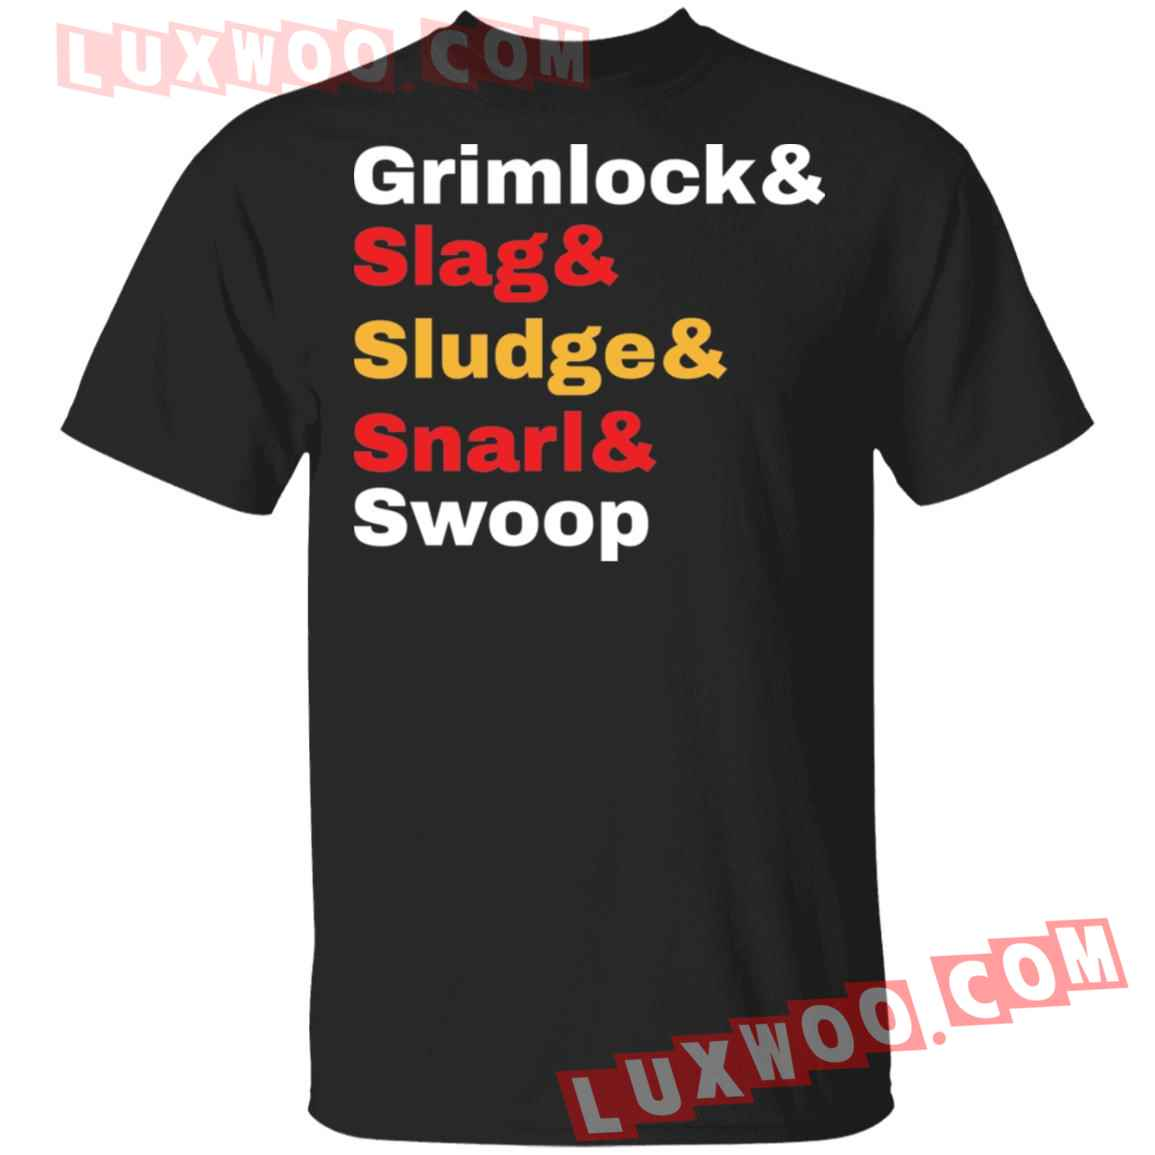 Grimlock Slag Sludge Snarl Swoop Shirt